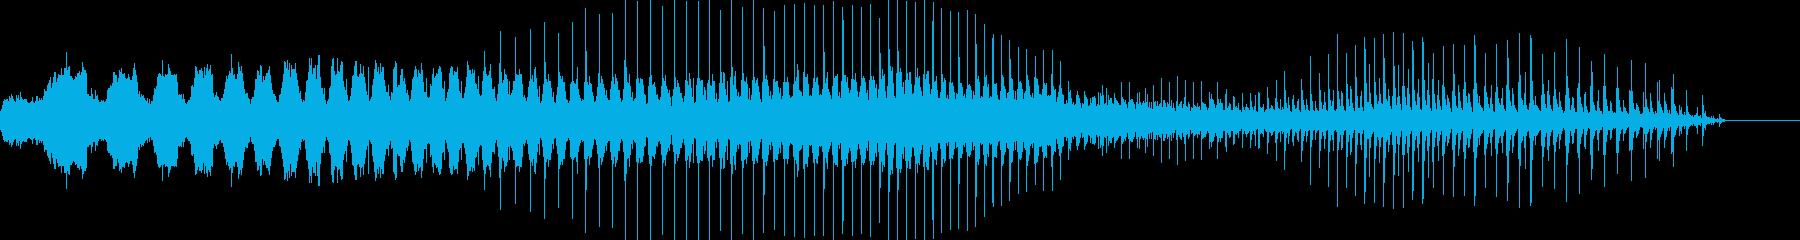 STEAM ENGINE、MUNK...の再生済みの波形